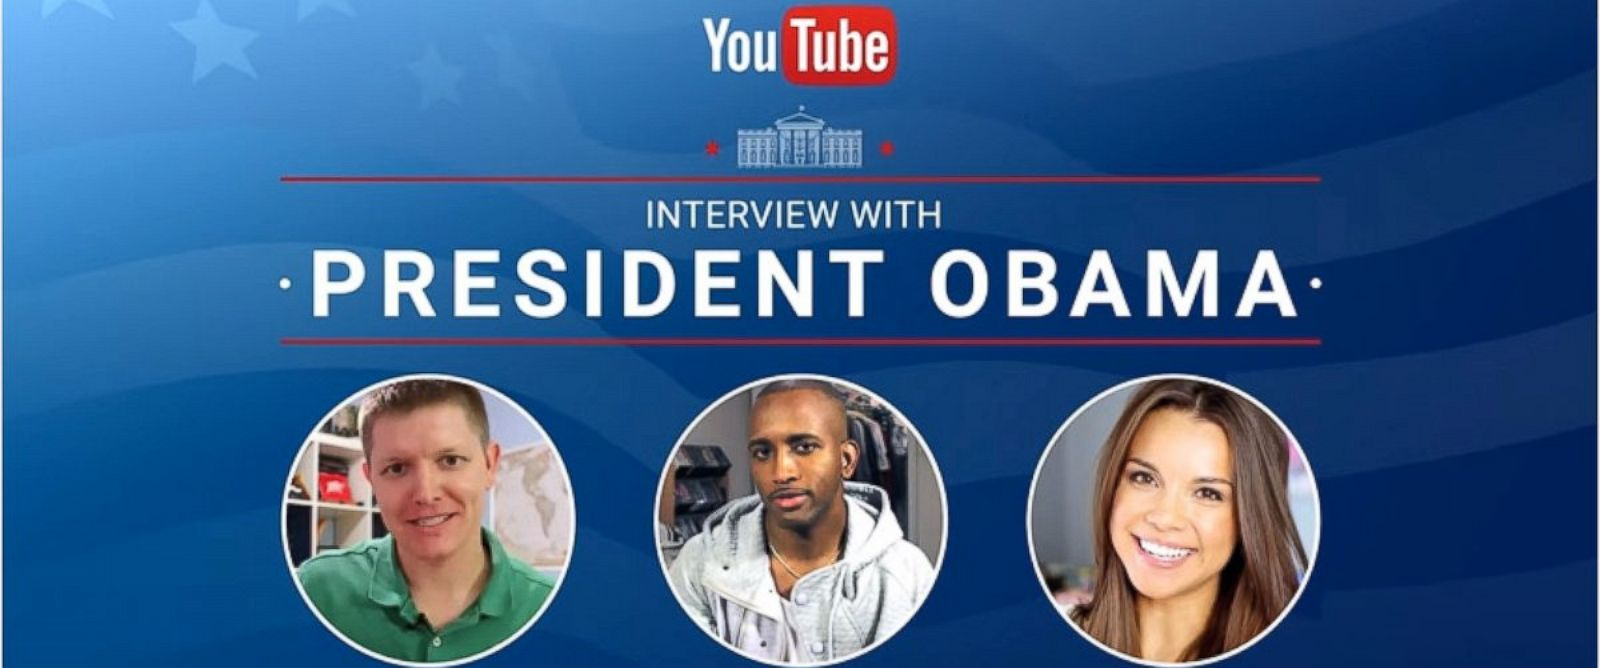 PHOTO: Three YouTube stars are set to interview President Obama on Jan. 15, 2016.